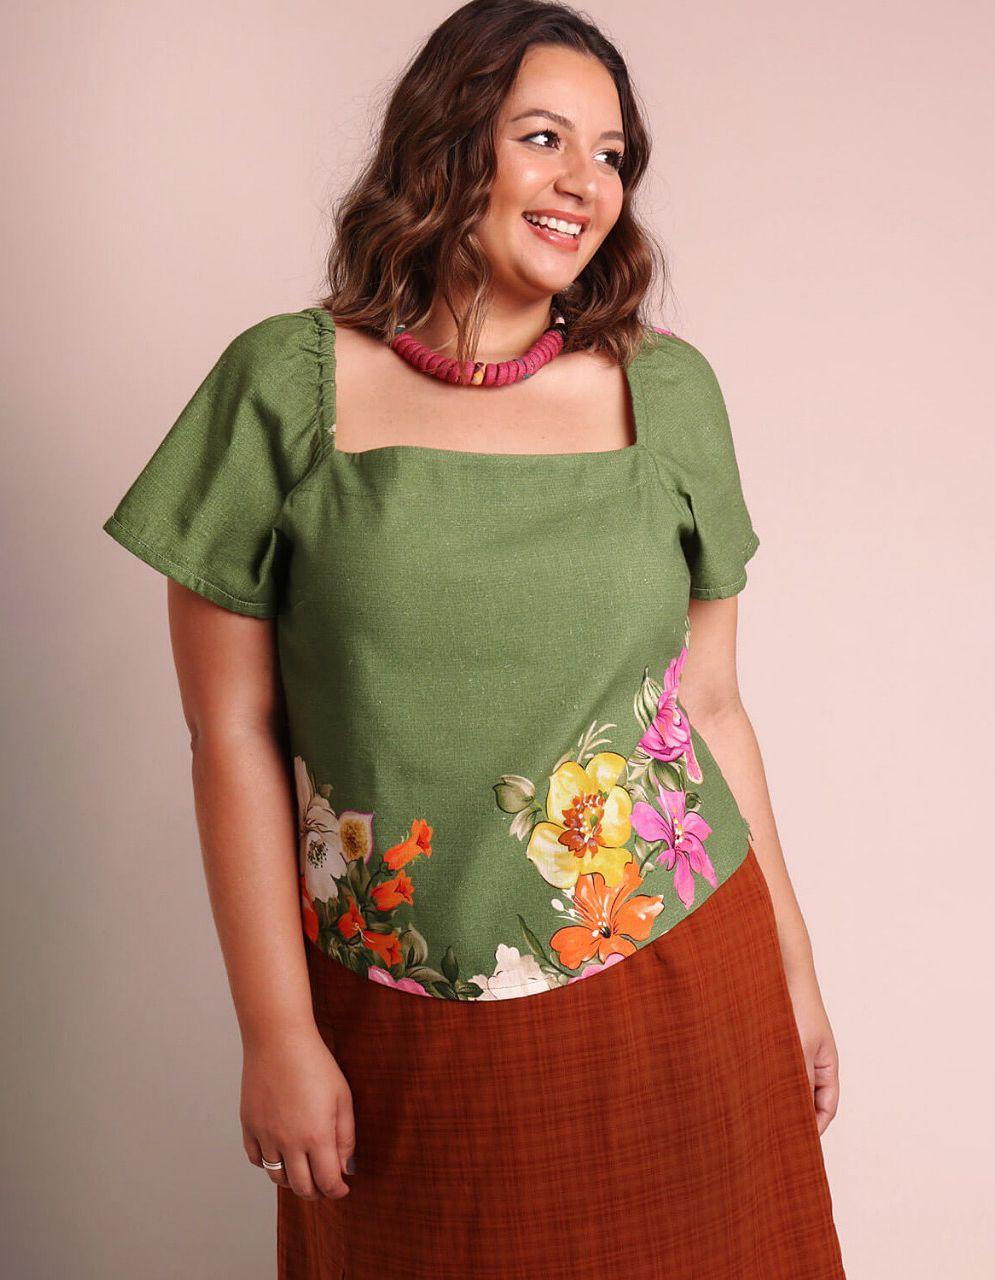 Blusa blanca o verde talla grande verano y manga corta Malagueta-57470MAL-A